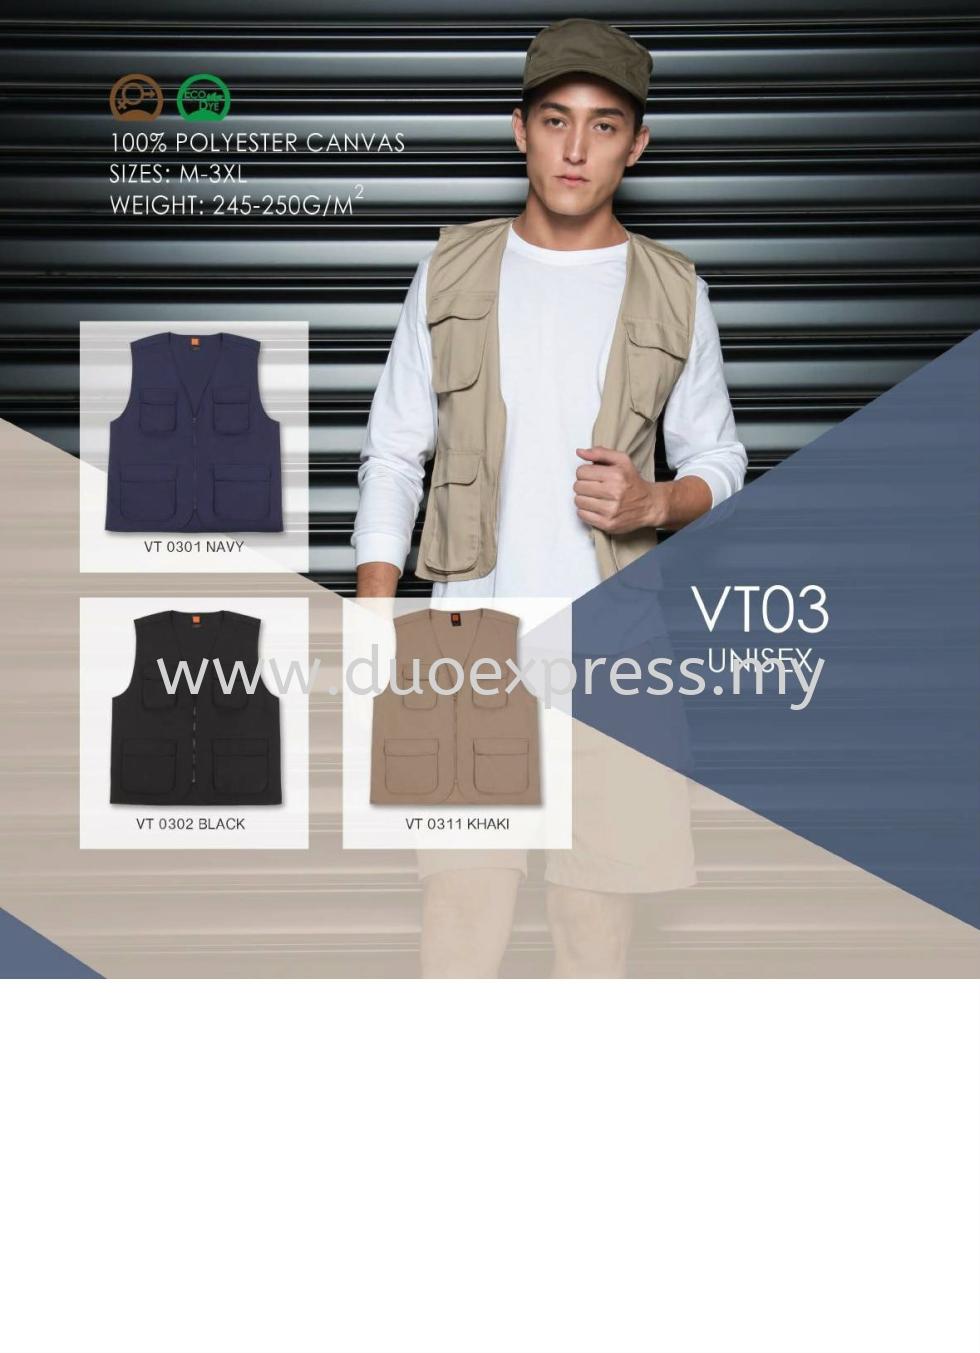 Windbreaker-Vest-Jacket VJ-03